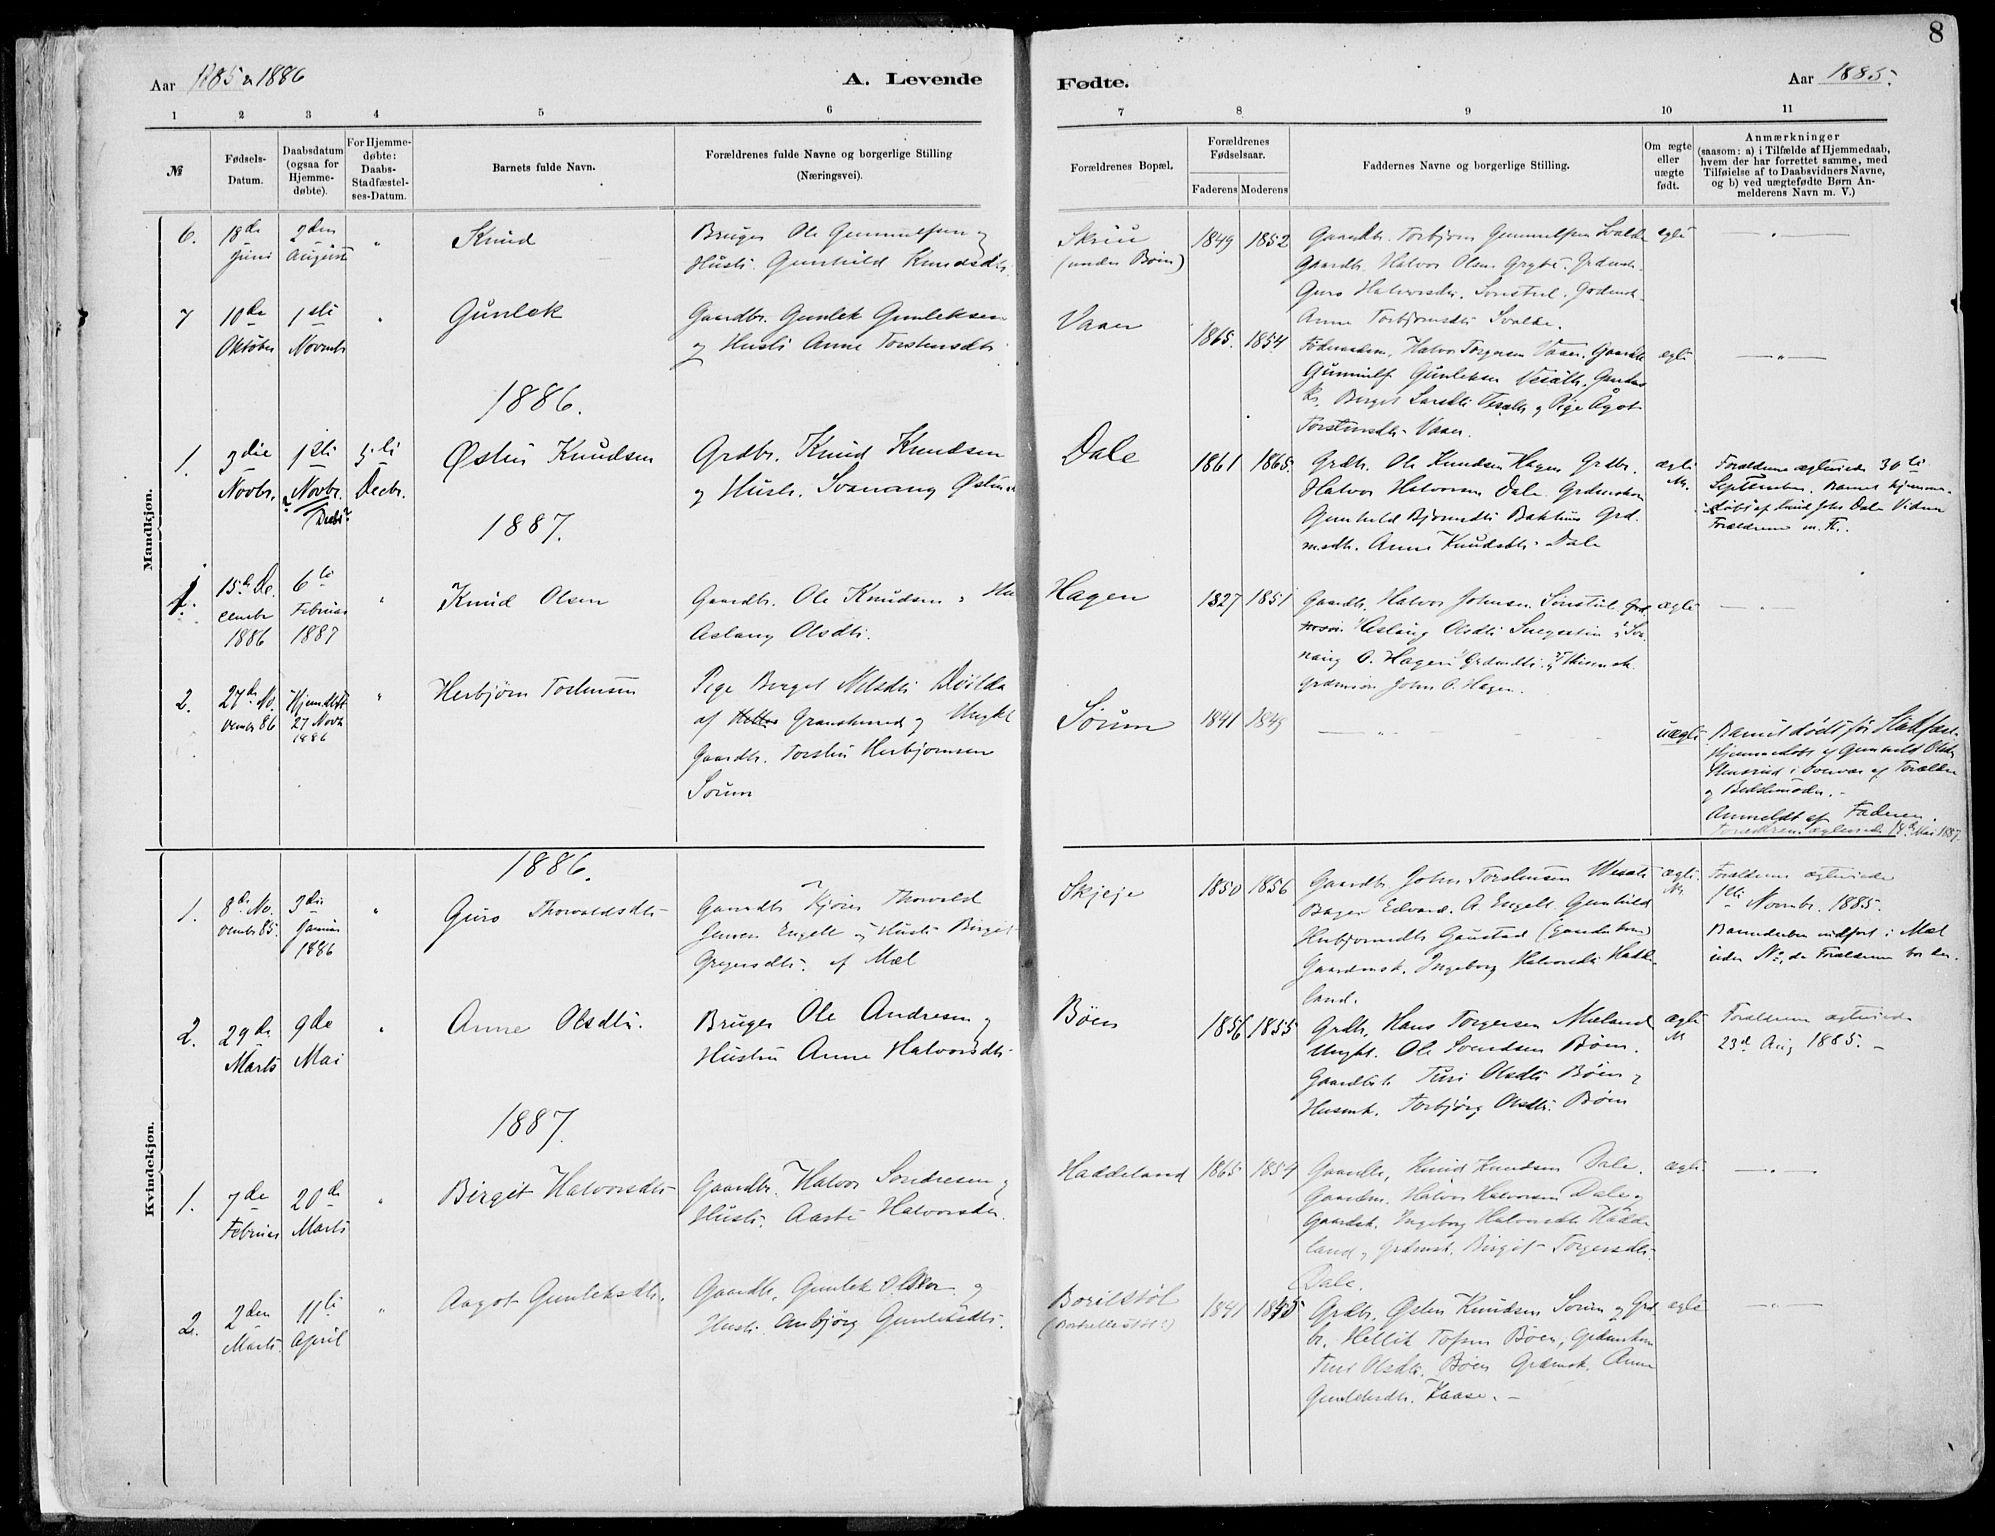 SAKO, Rjukan kirkebøker, F/Fa/L0001: Ministerialbok nr. 1, 1878-1912, s. 8